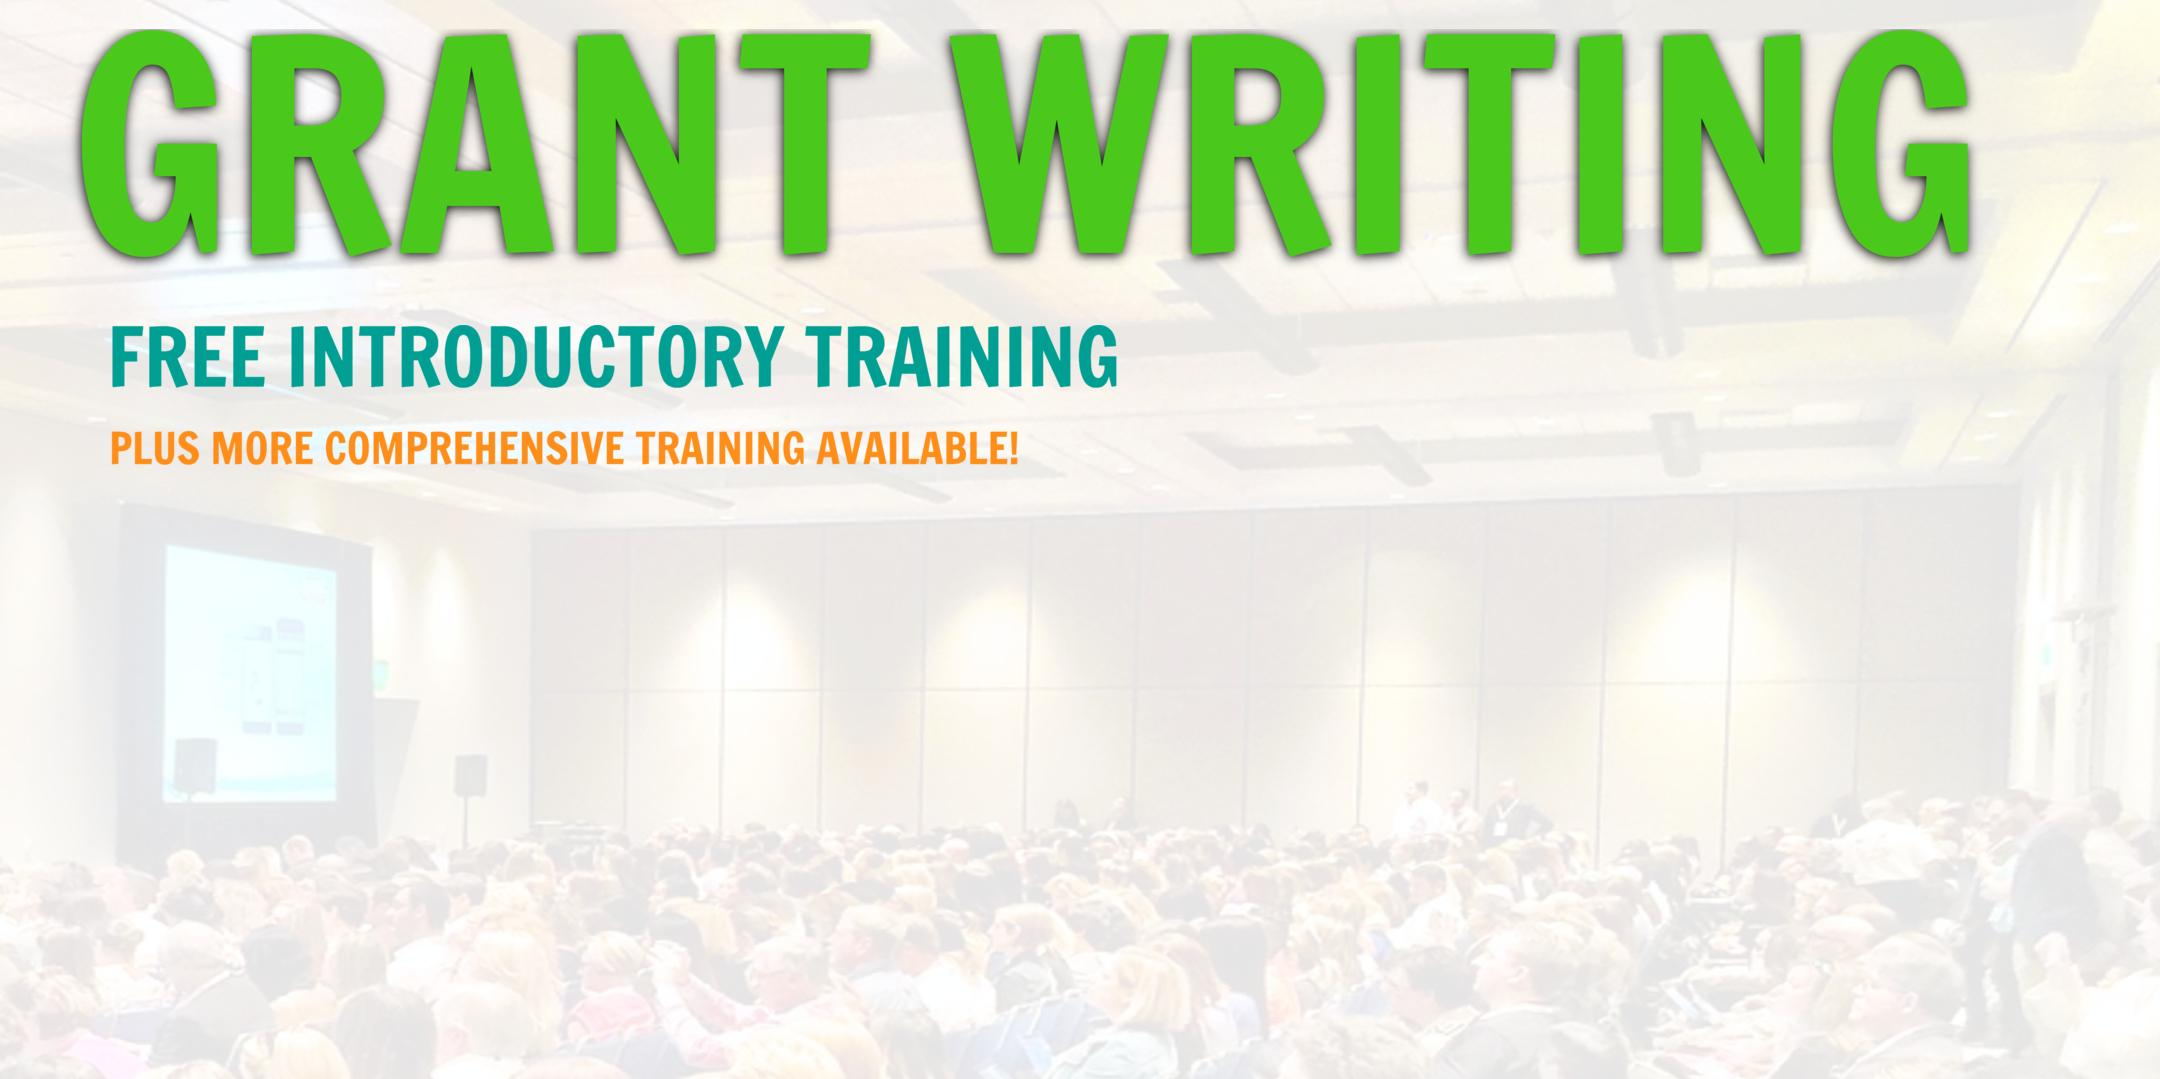 Grant Writing Introductory Training... Burbank, California